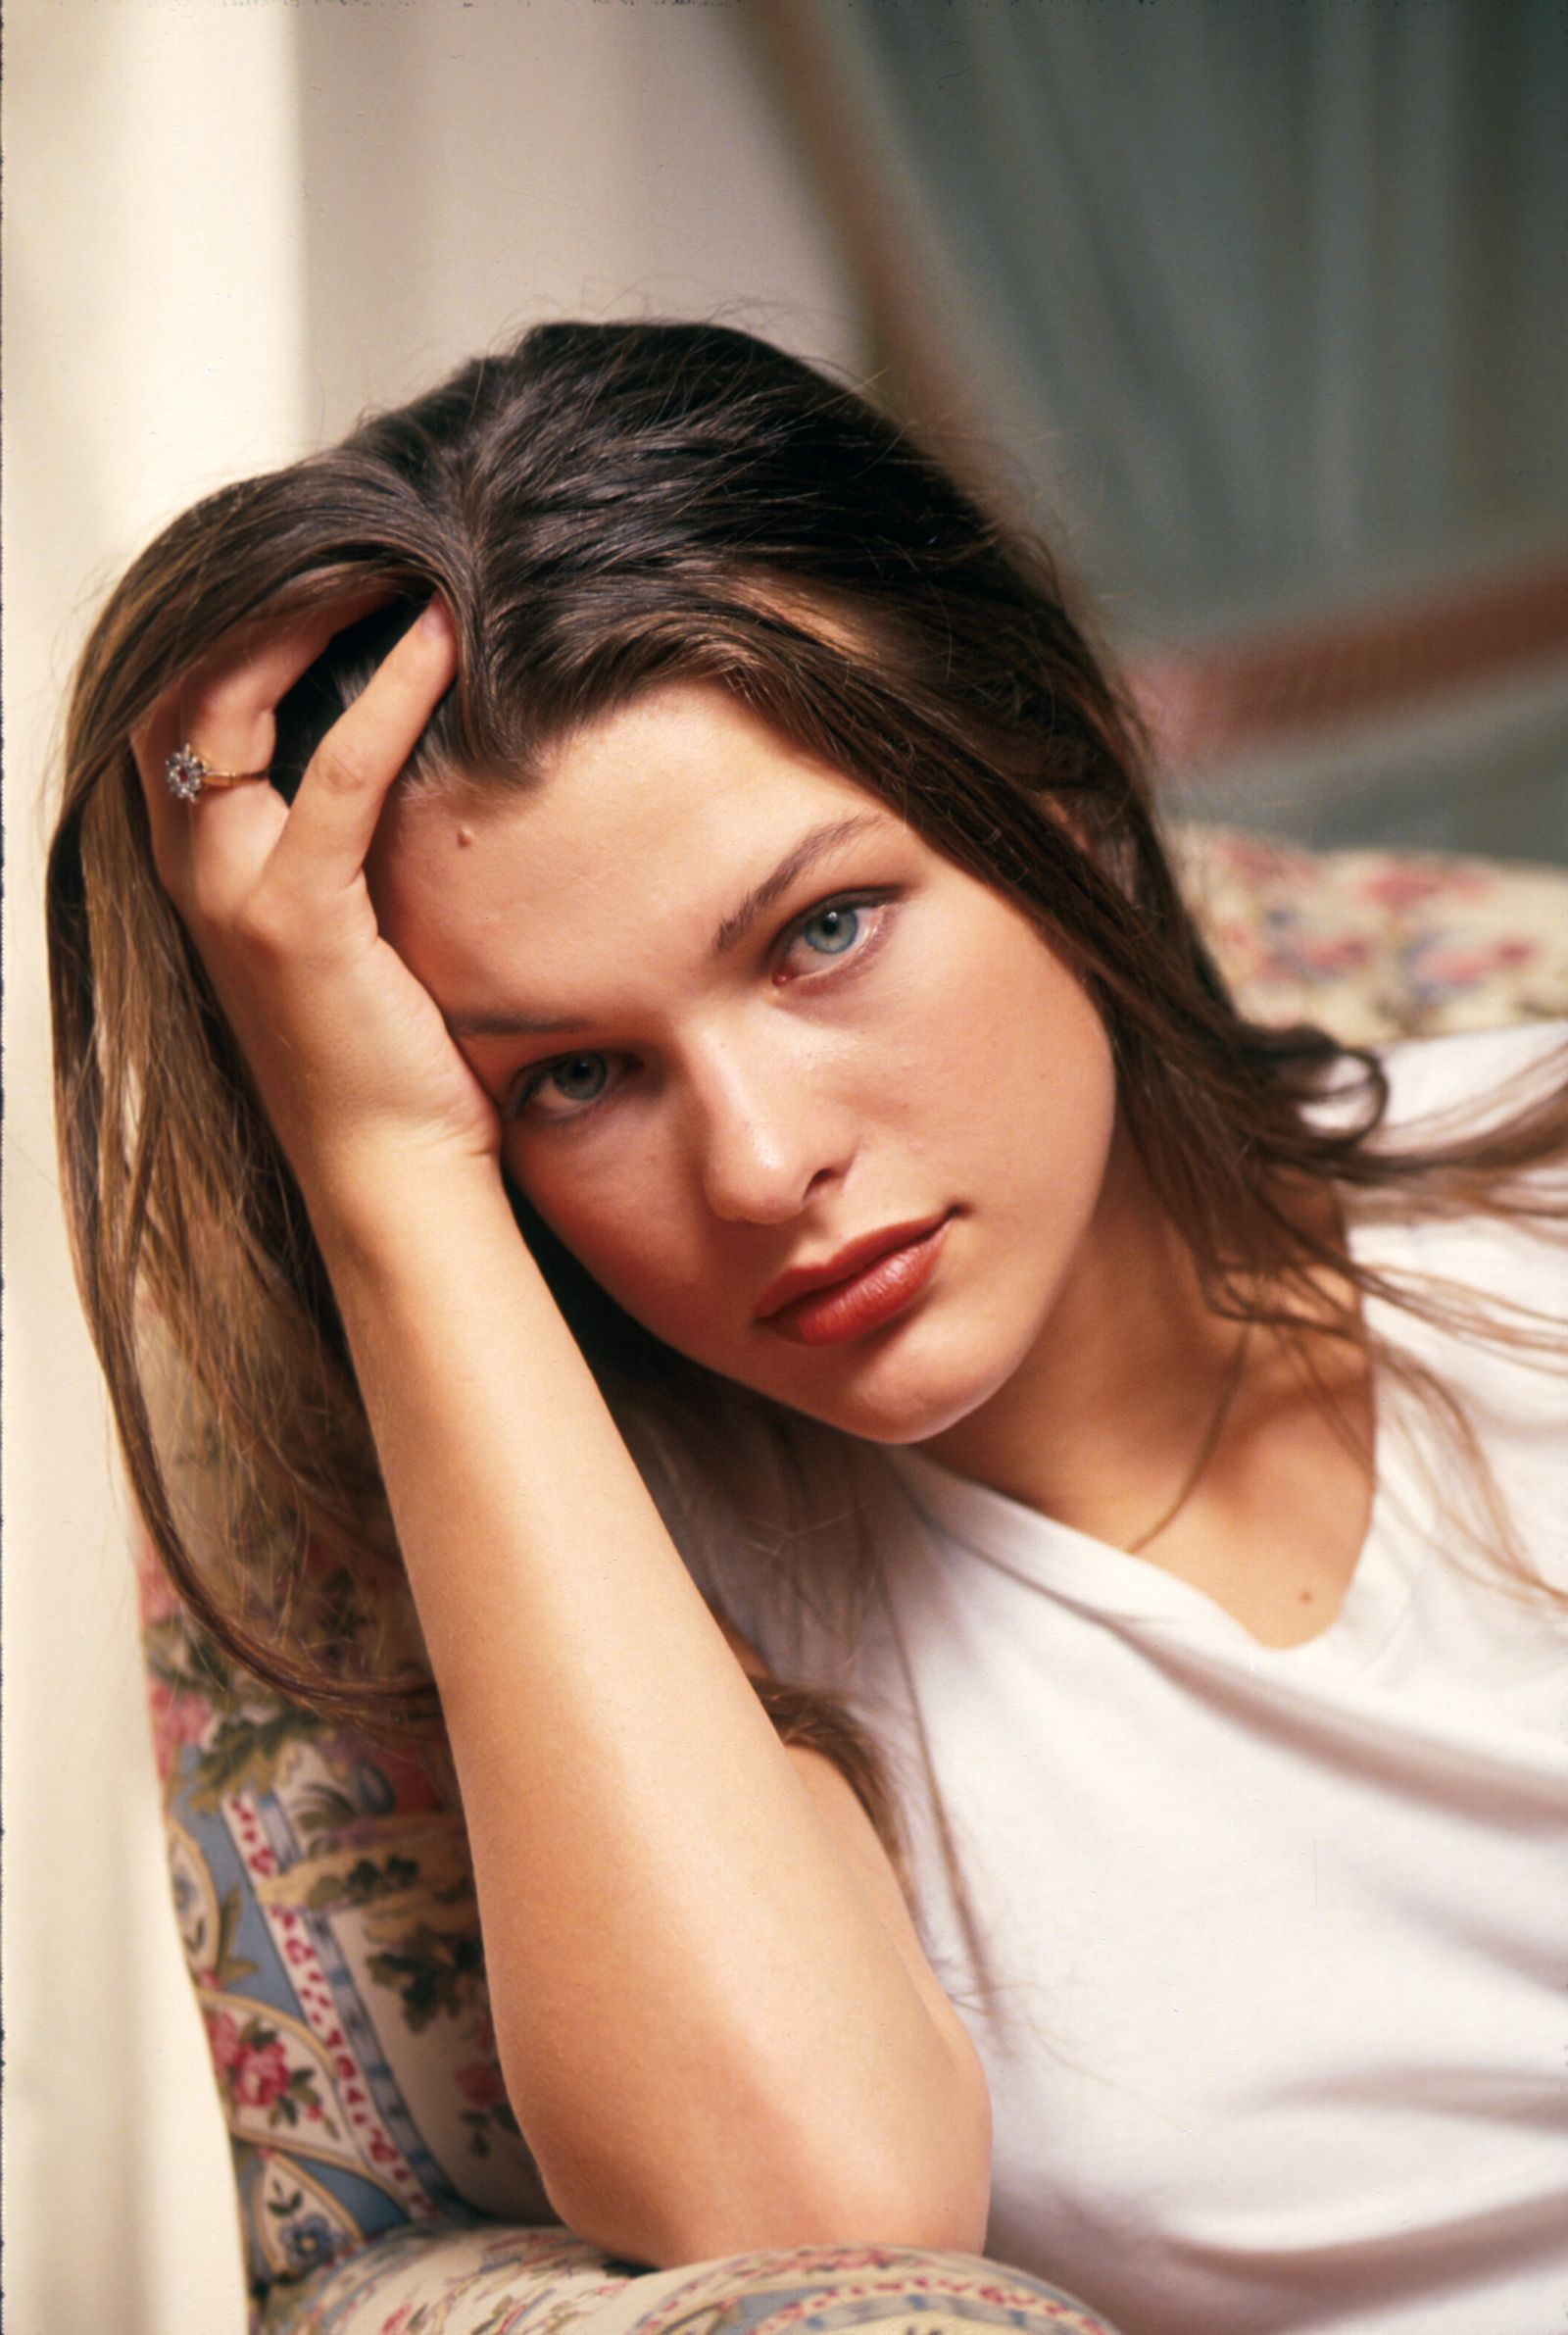 Photos of Milla Jovovich